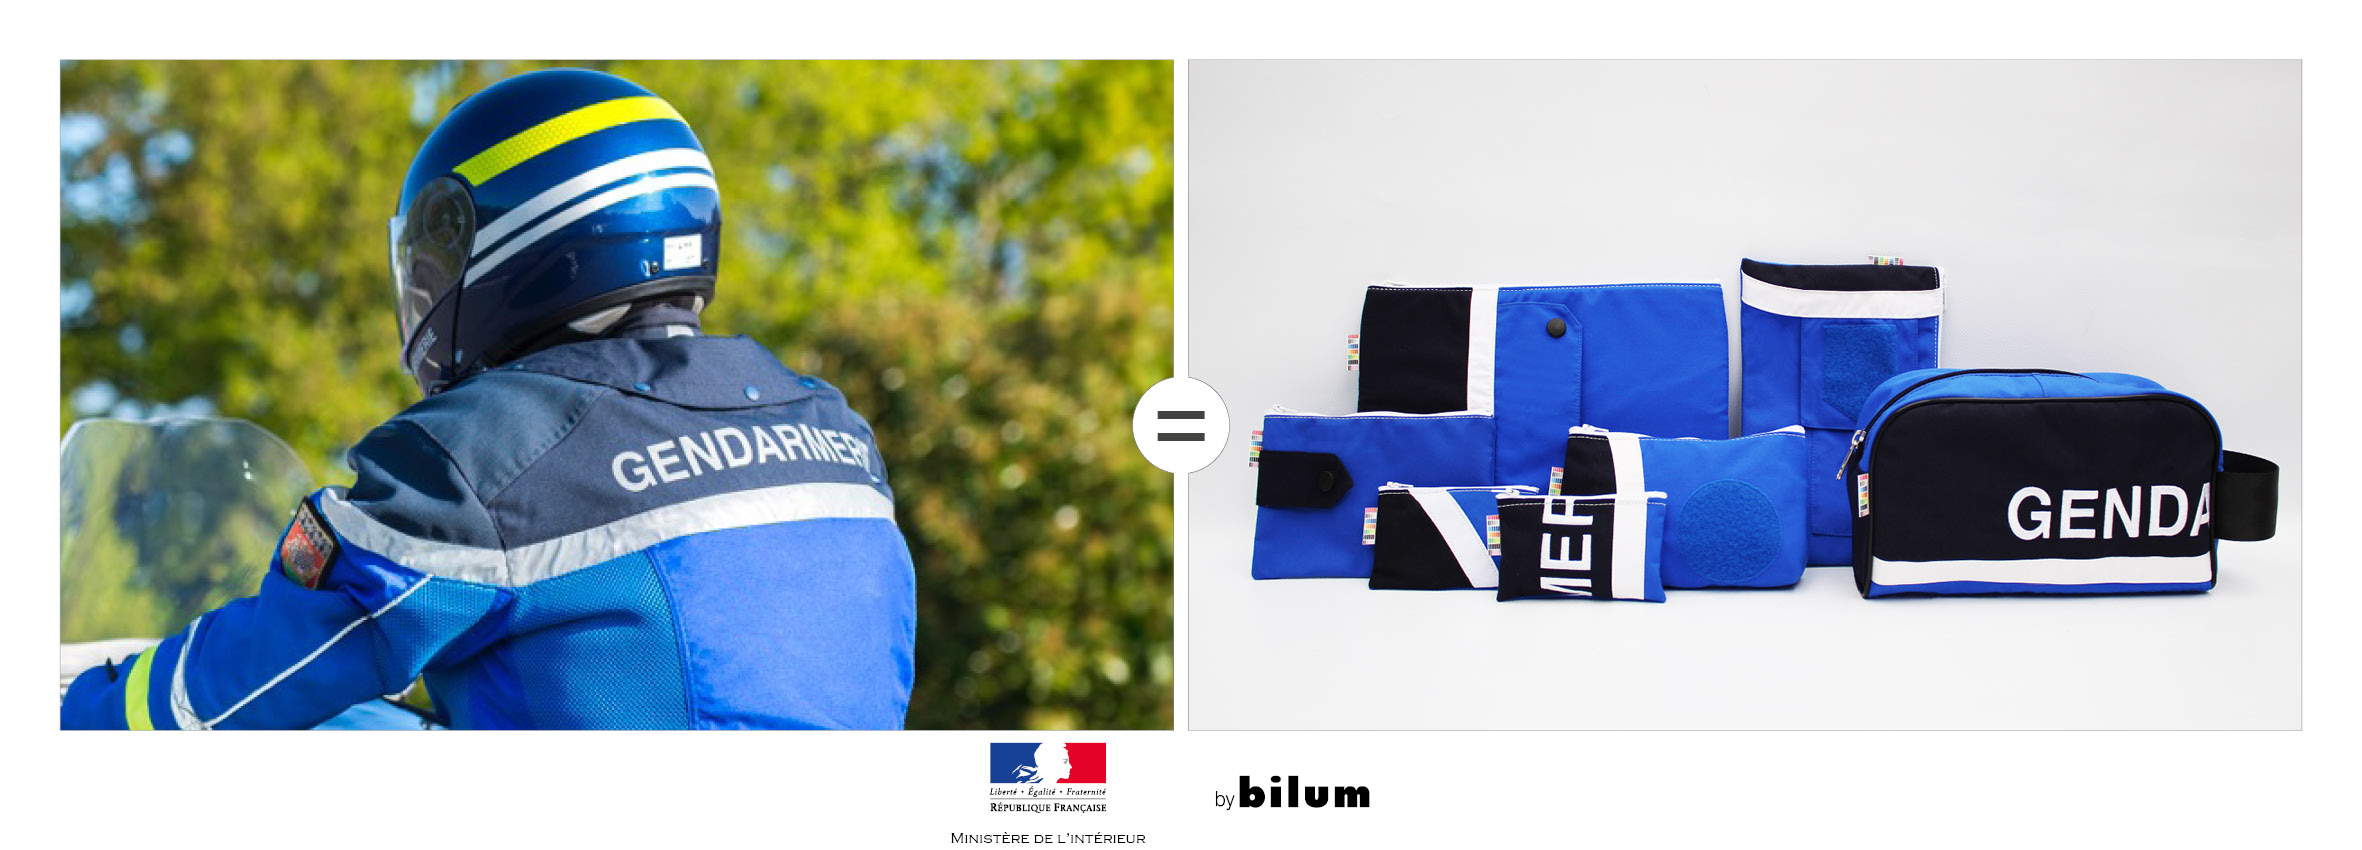 blouson-gendarmerie-trousse-toilette-bilum